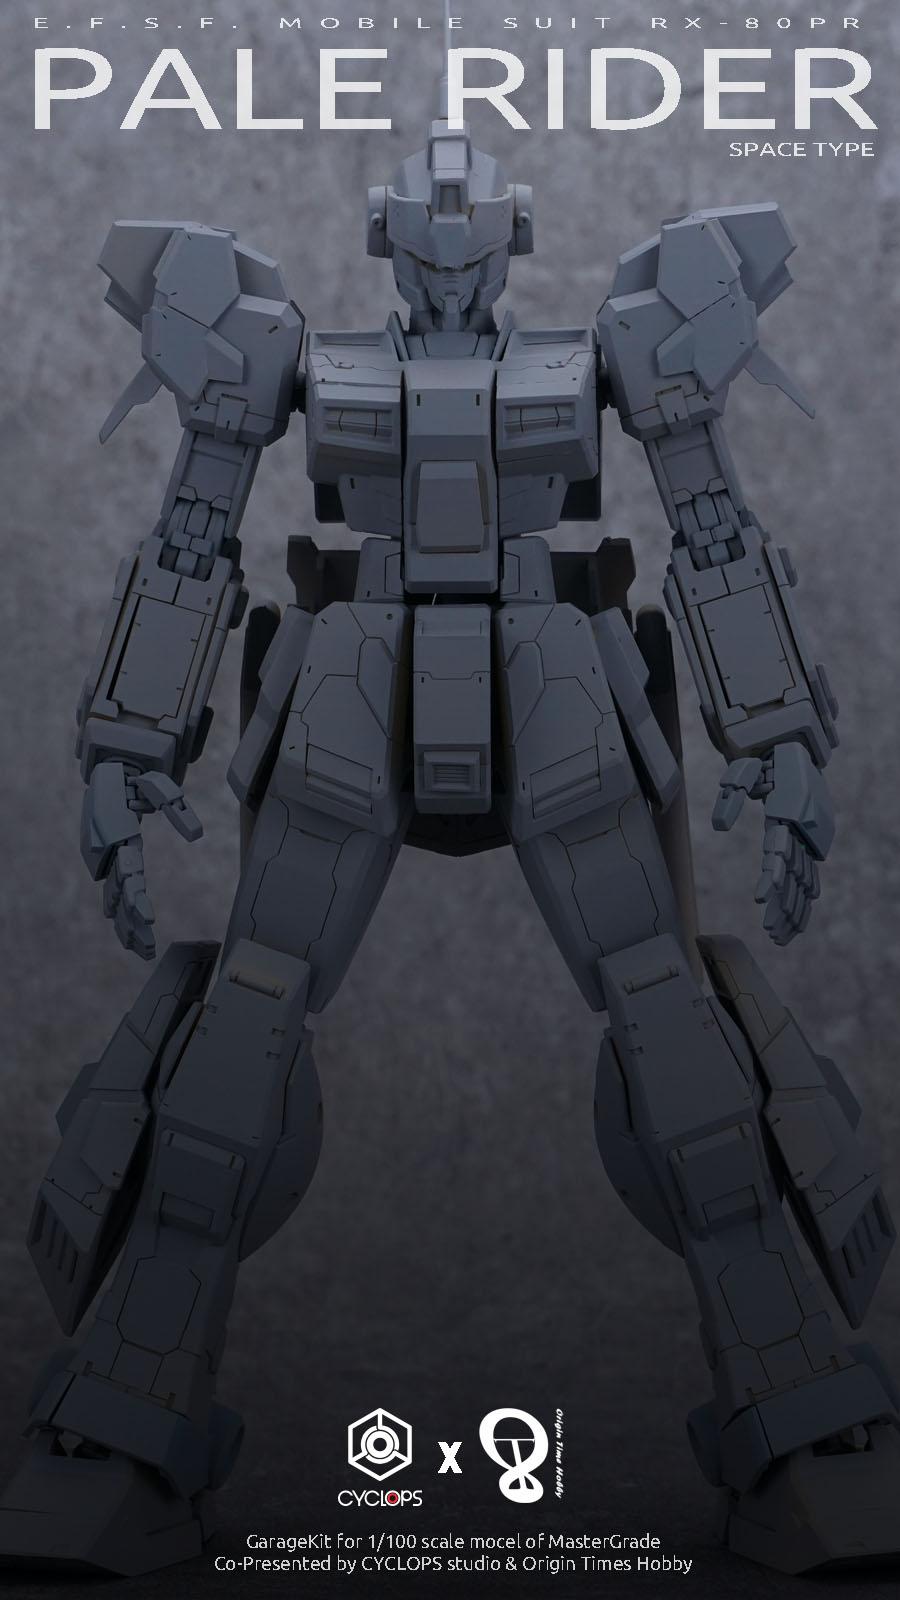 G600_MG_pale_rider_rx80PR_space_type_003.jpg